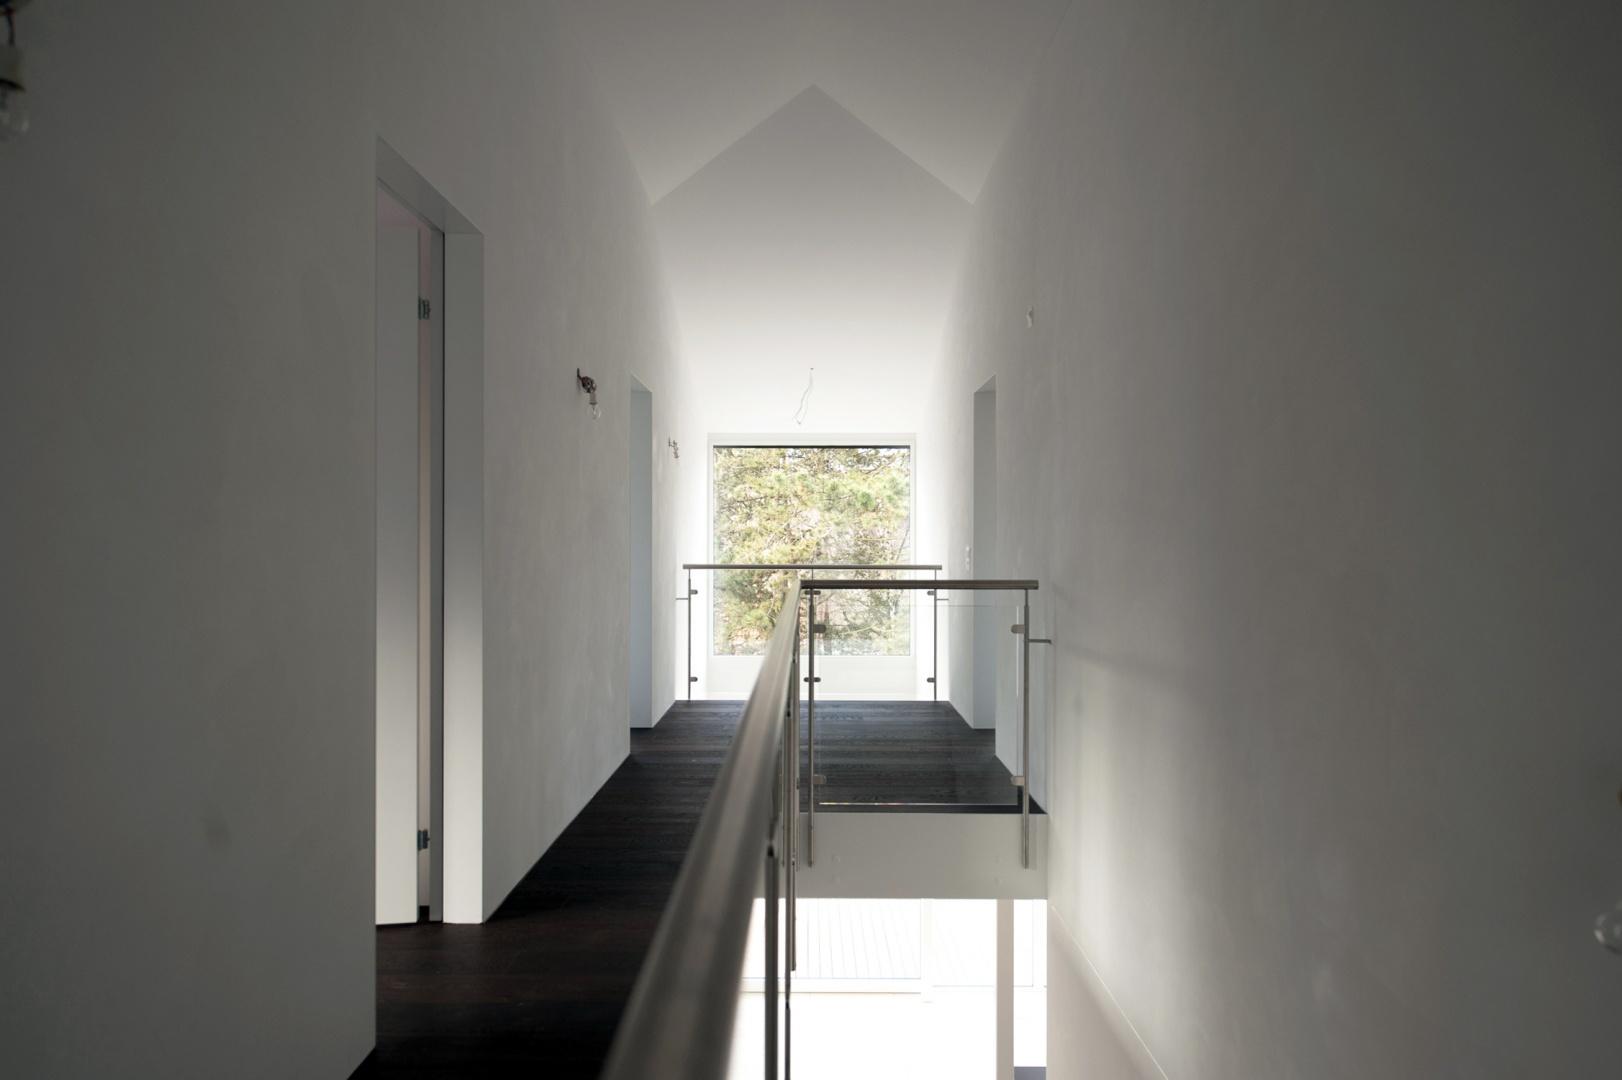 Treppenraum mit Galerie © Juho Nyberg Architektur GmbH, Forchstrasse 30, 8008 Zürich